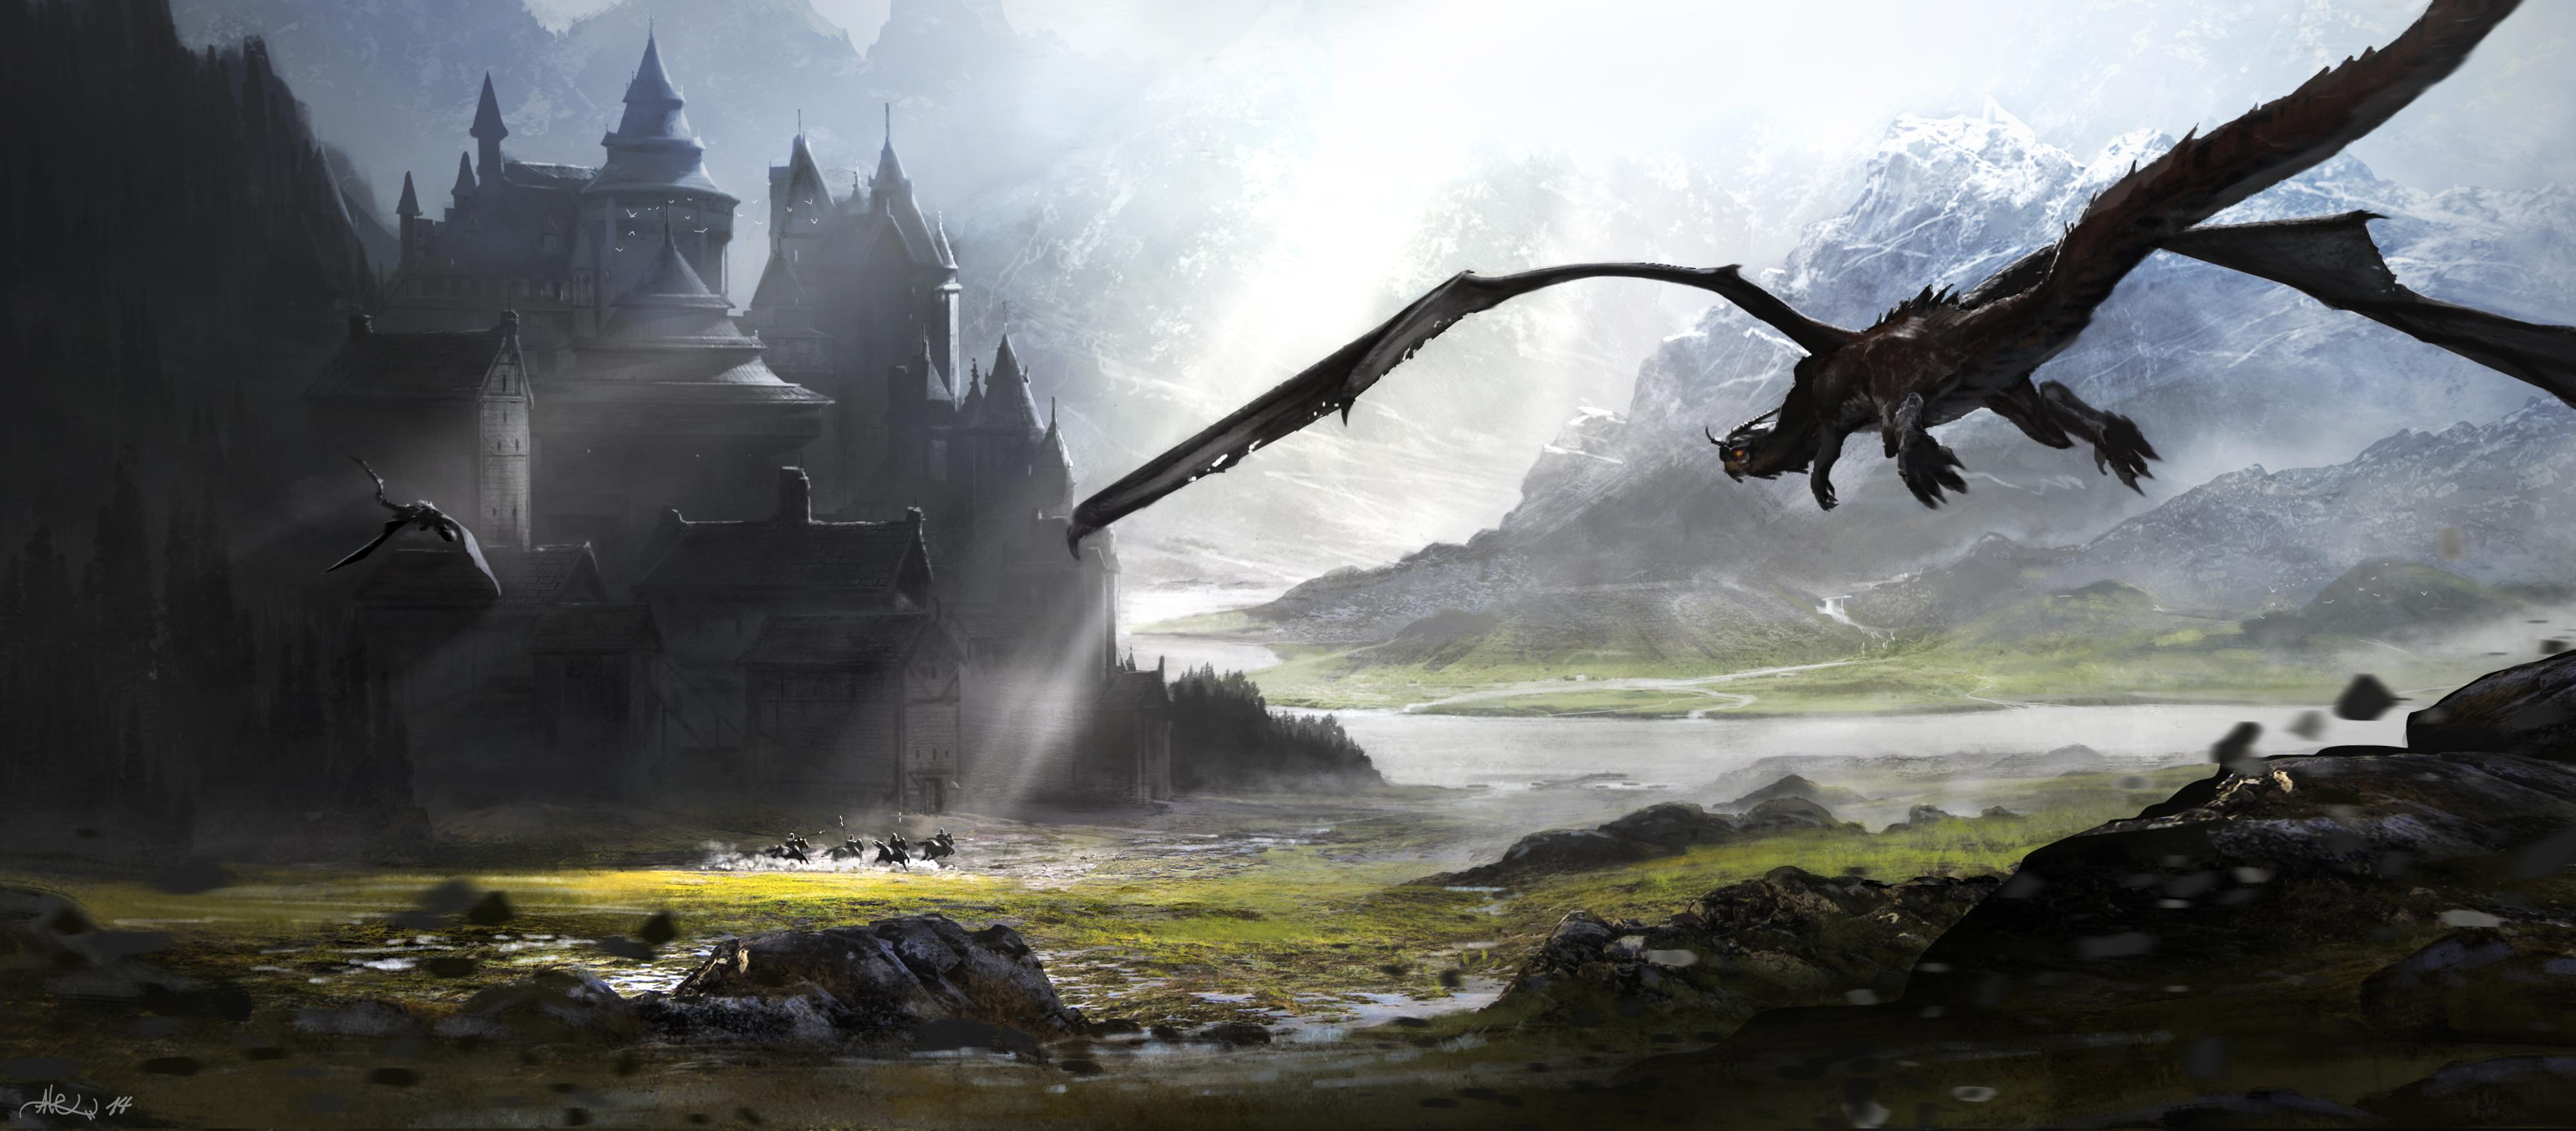 Première rencontre ? [Atom] Dragon_attack_fin_by_alex_olmedo-d7yoqn0